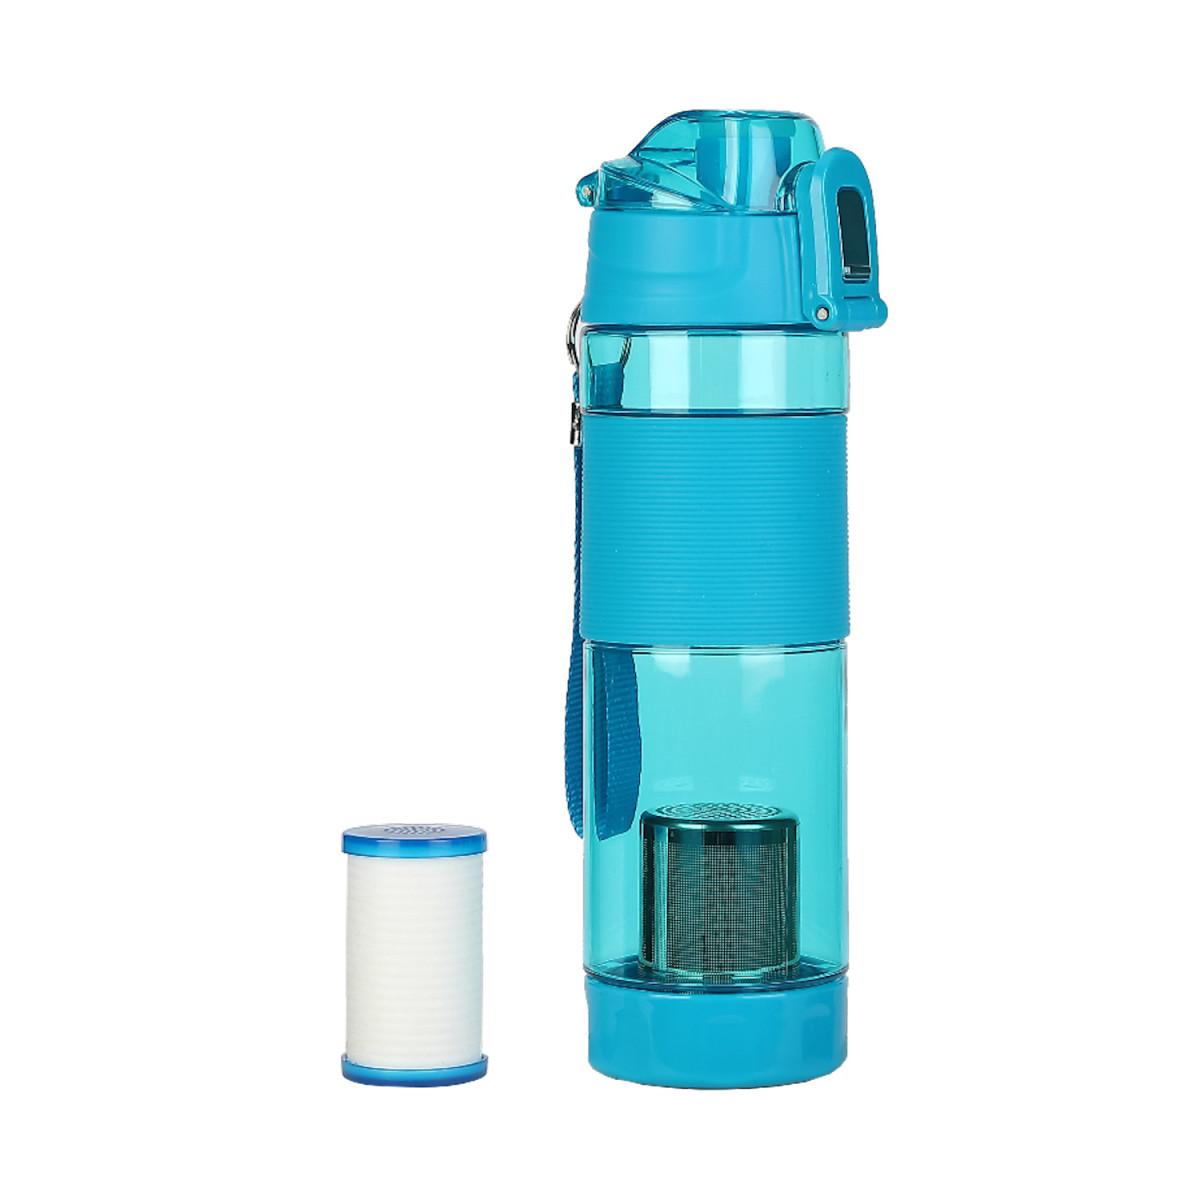 Фильтр-кувшин для воды Sonaki HWP-100B